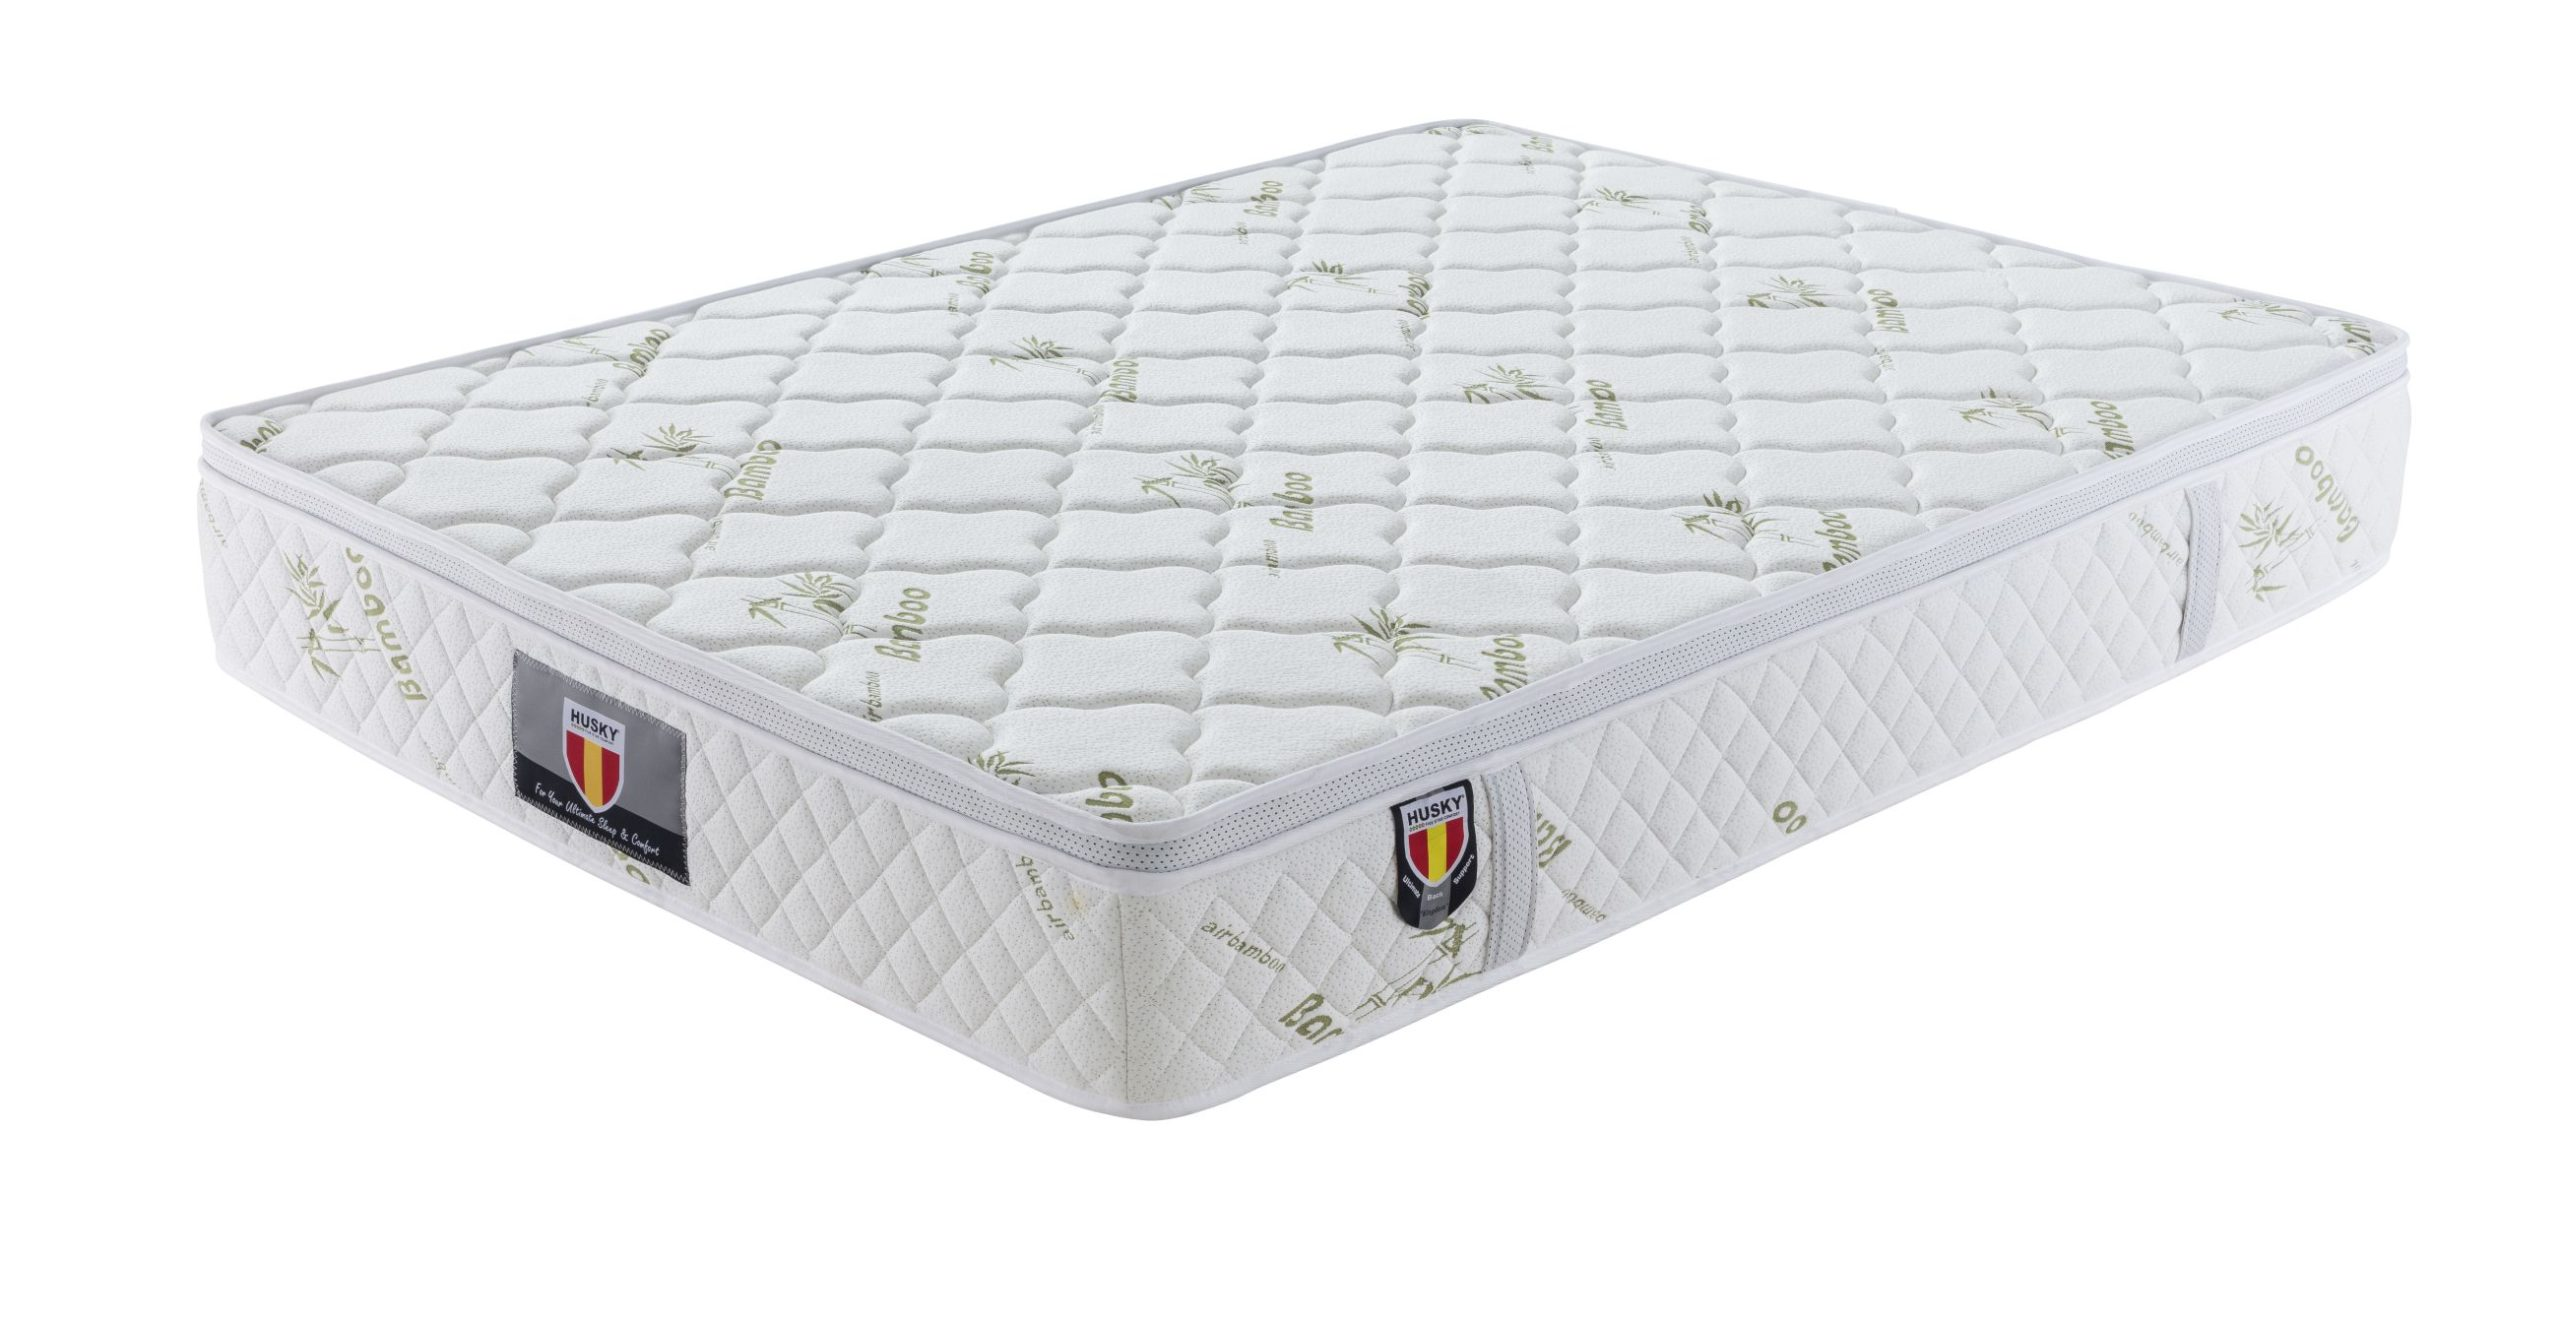 kingdom hd pocket springs11 bamboo cover euro pillow top king mattress